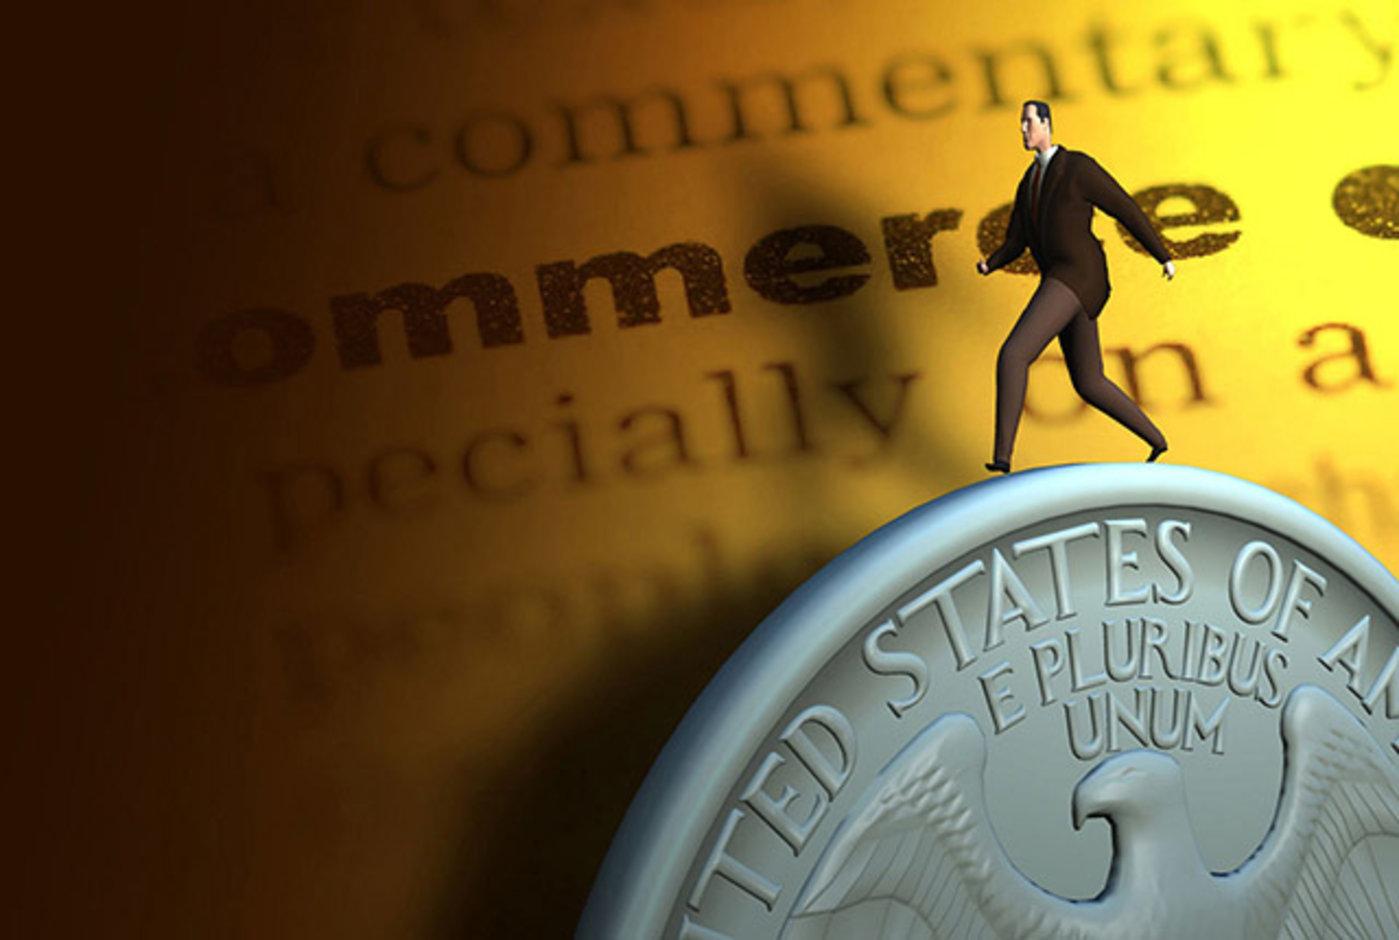 p2p网贷股票配资优秀门户,近期互联网金融12大热点解读,关键词:热钱涌入、股权配资、套现、曲折上市......